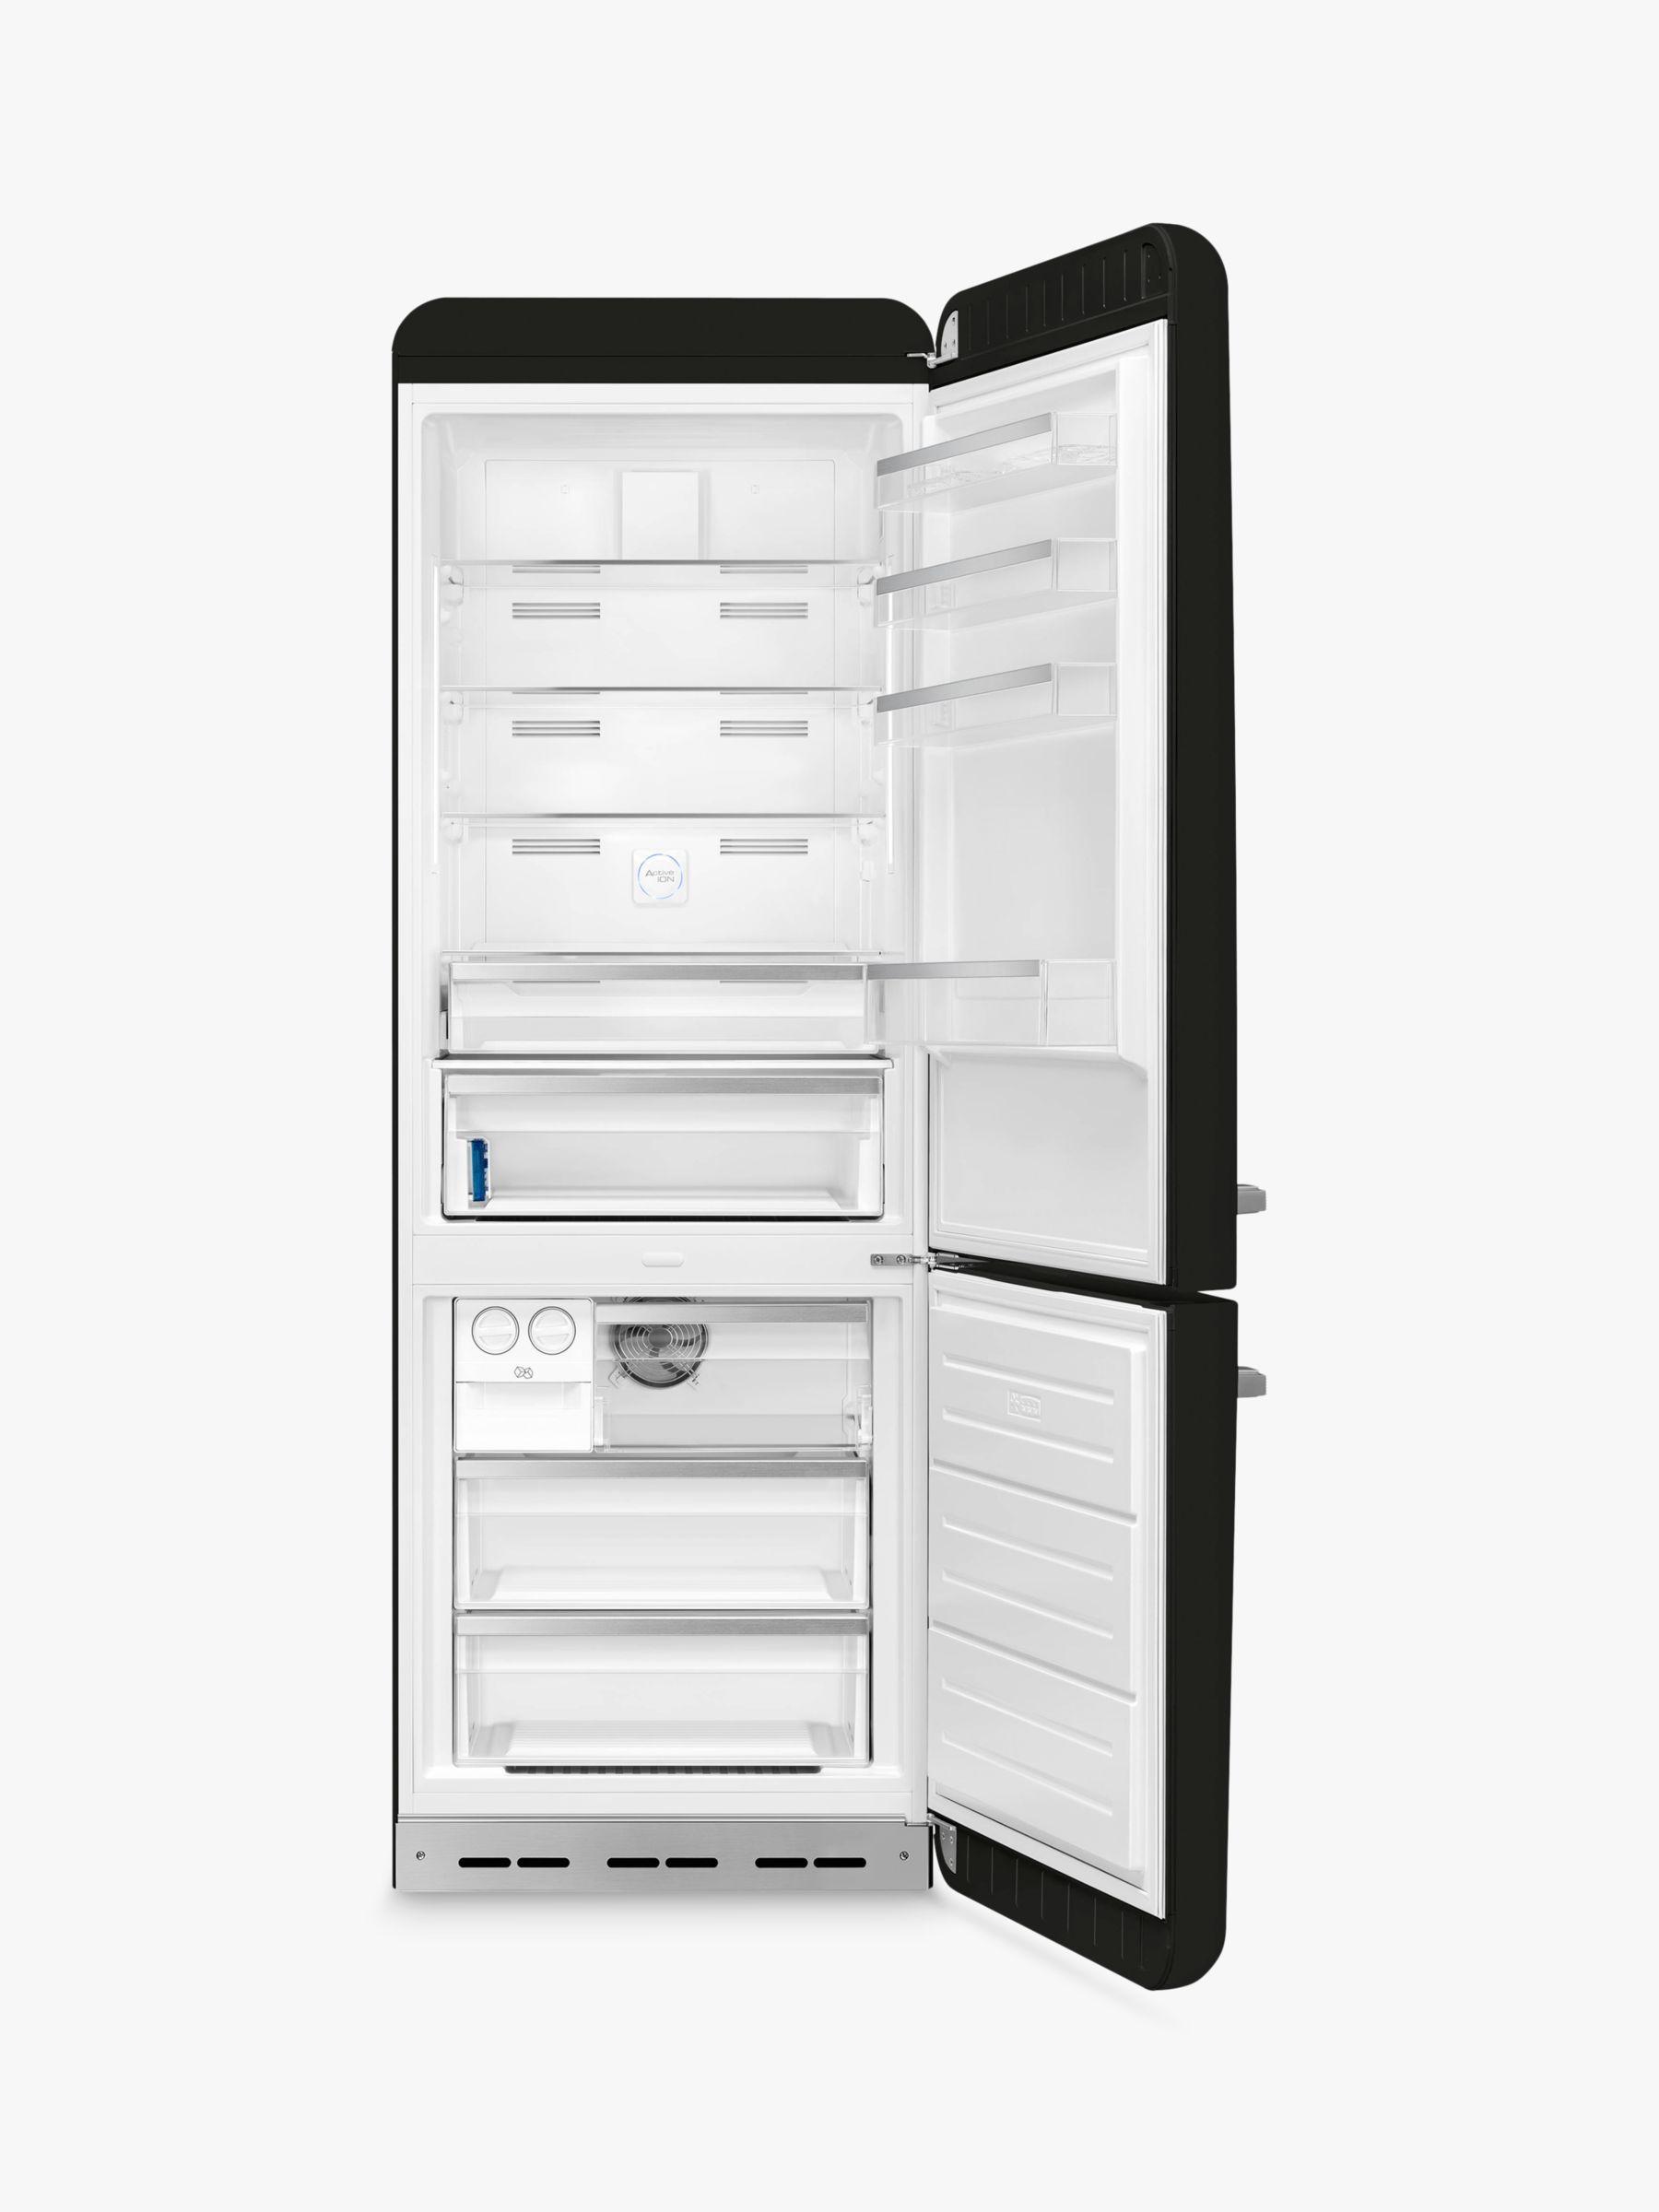 American Fridge Freezer No Plumbing Required